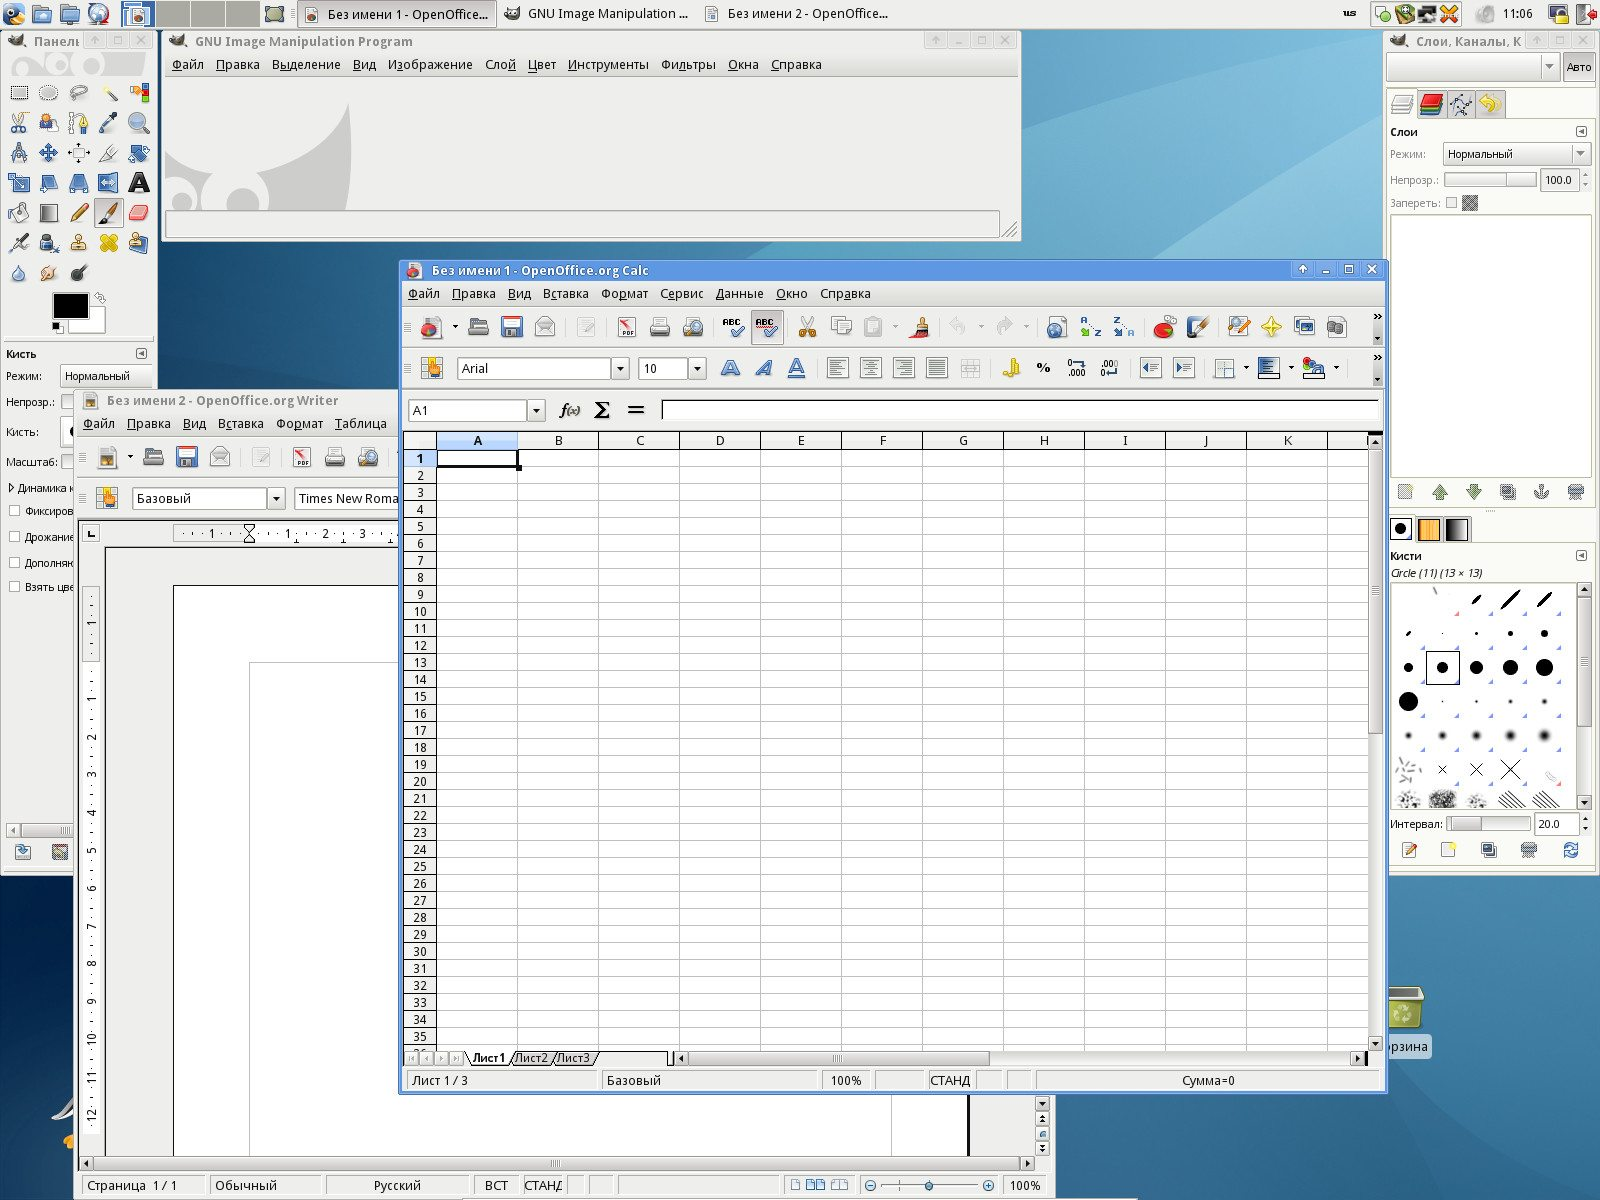 Calculate Linux 9.6 Xfce